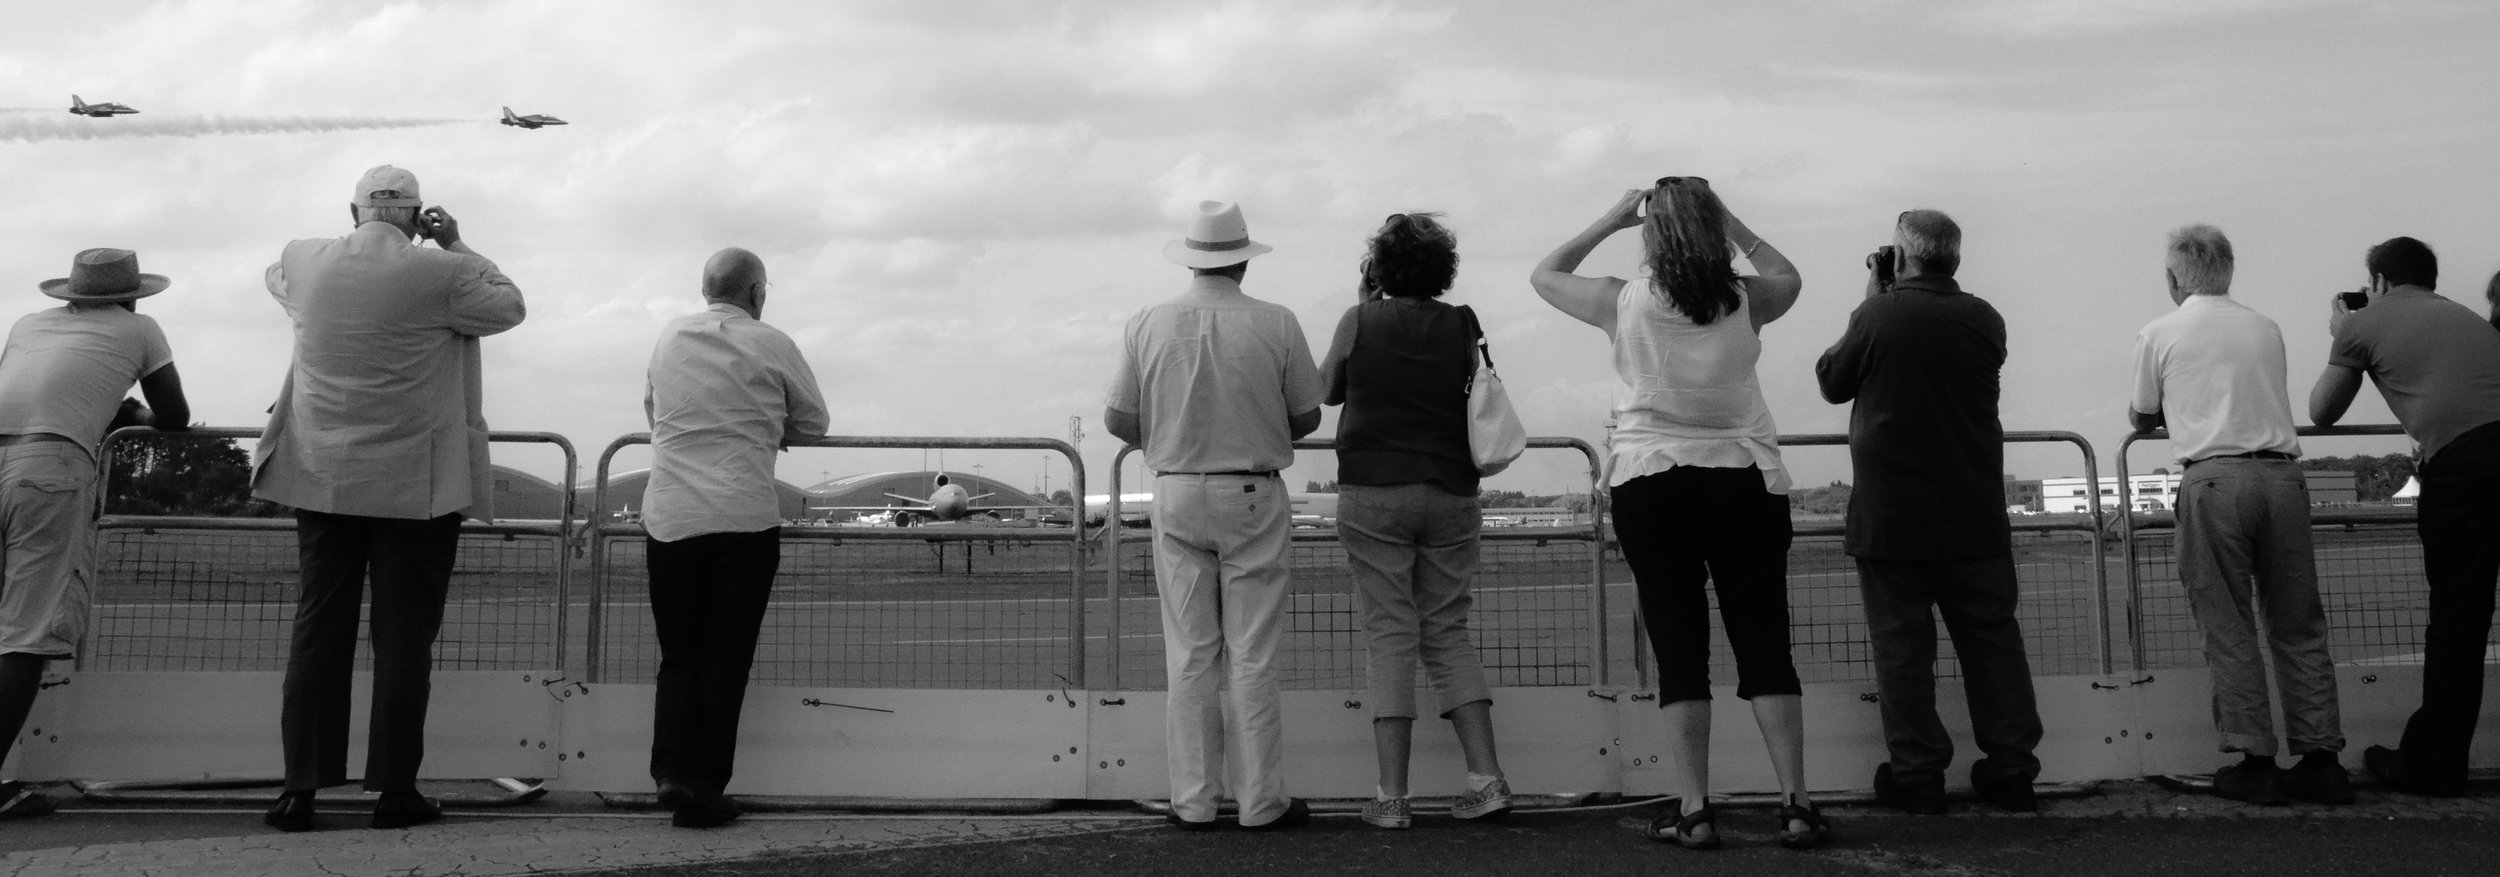 Spectators at Farnborough Air Show, Farnborough, UK 2015. © Mike Best